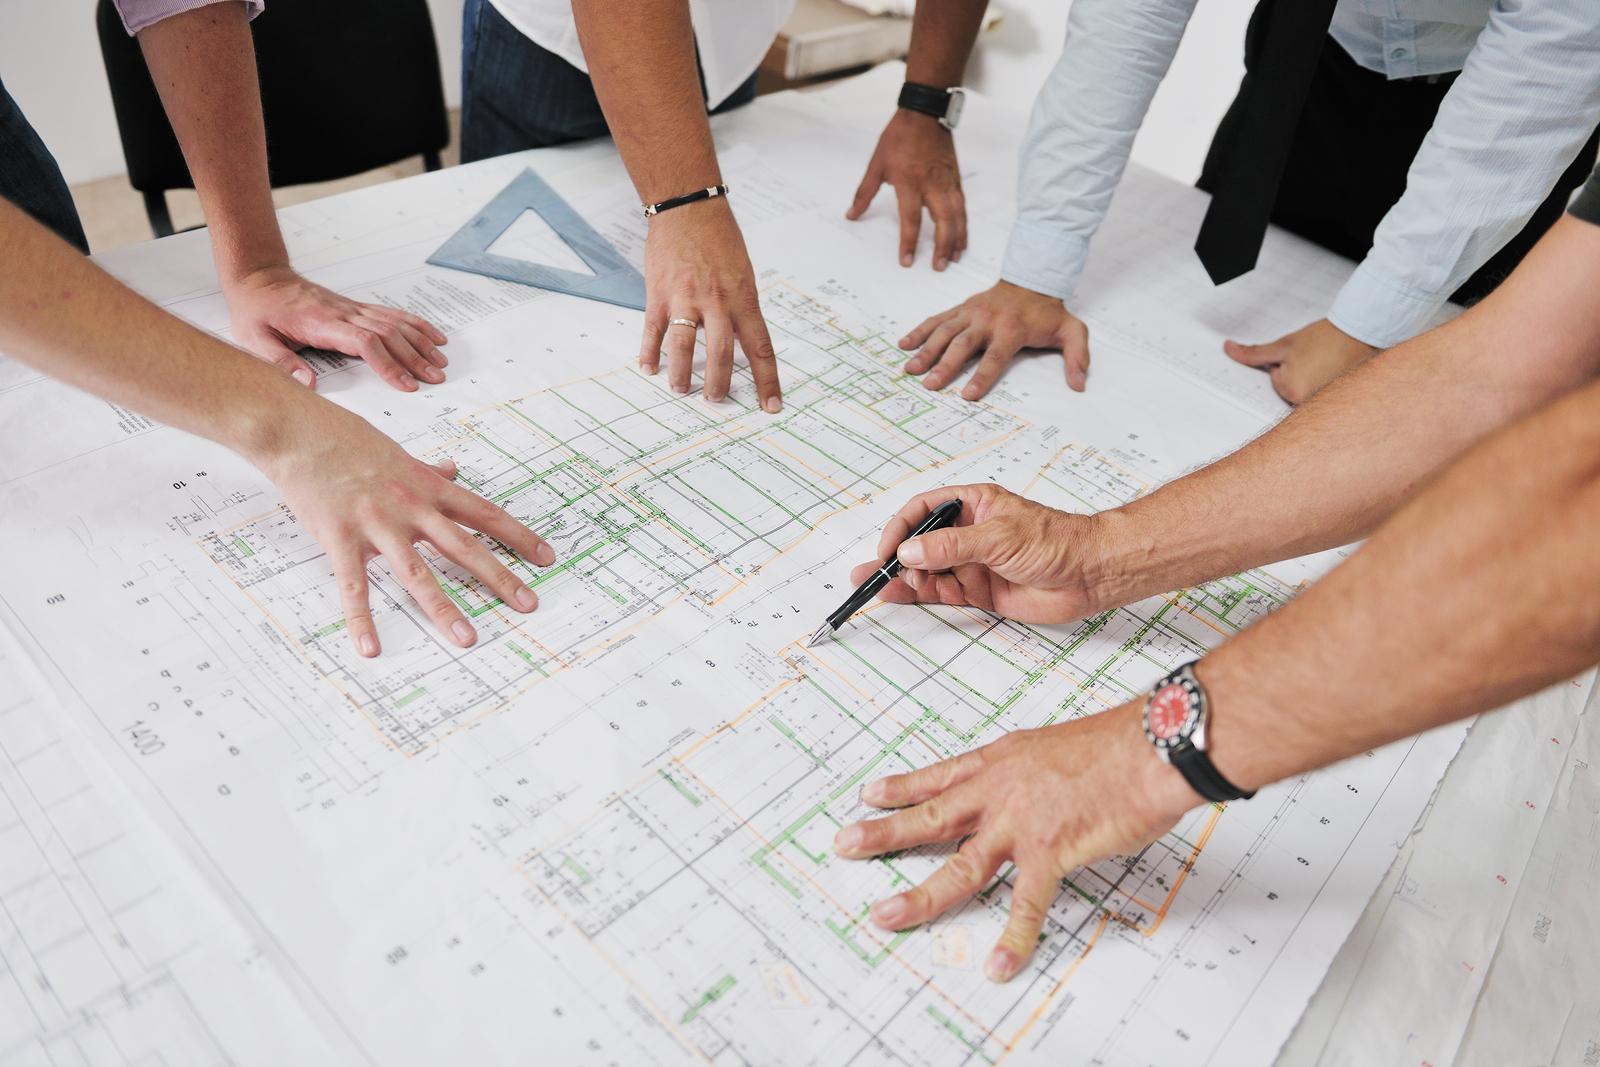 Arhitekt načrtovanje, vir: aiacoc.org